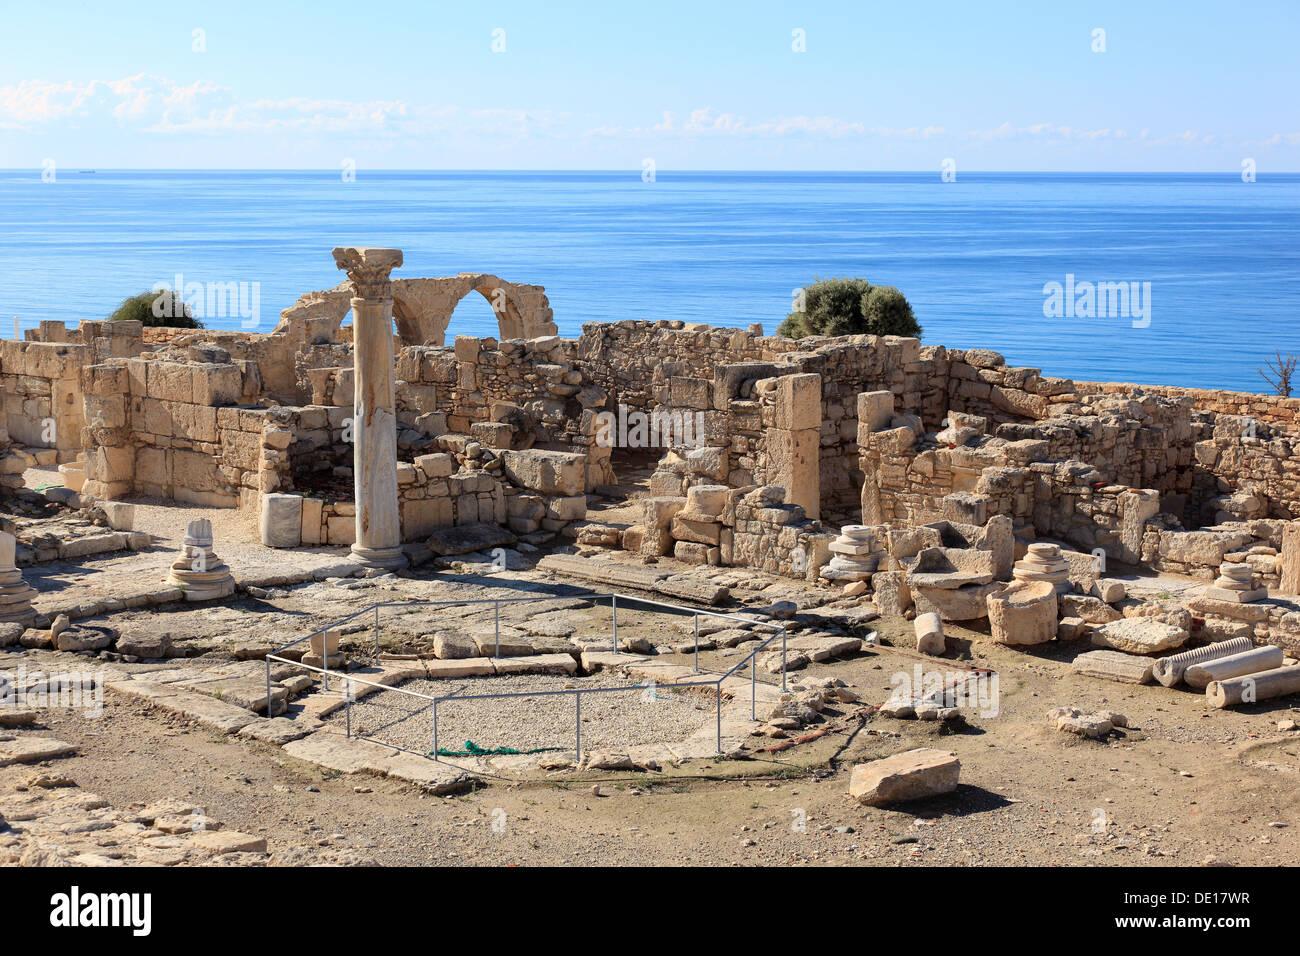 Cyprus, Kourion, Assyrian Ku-ri-i, ancient Greek, Latin, curium, historical, ancient archaeological site, ruins - Stock Image